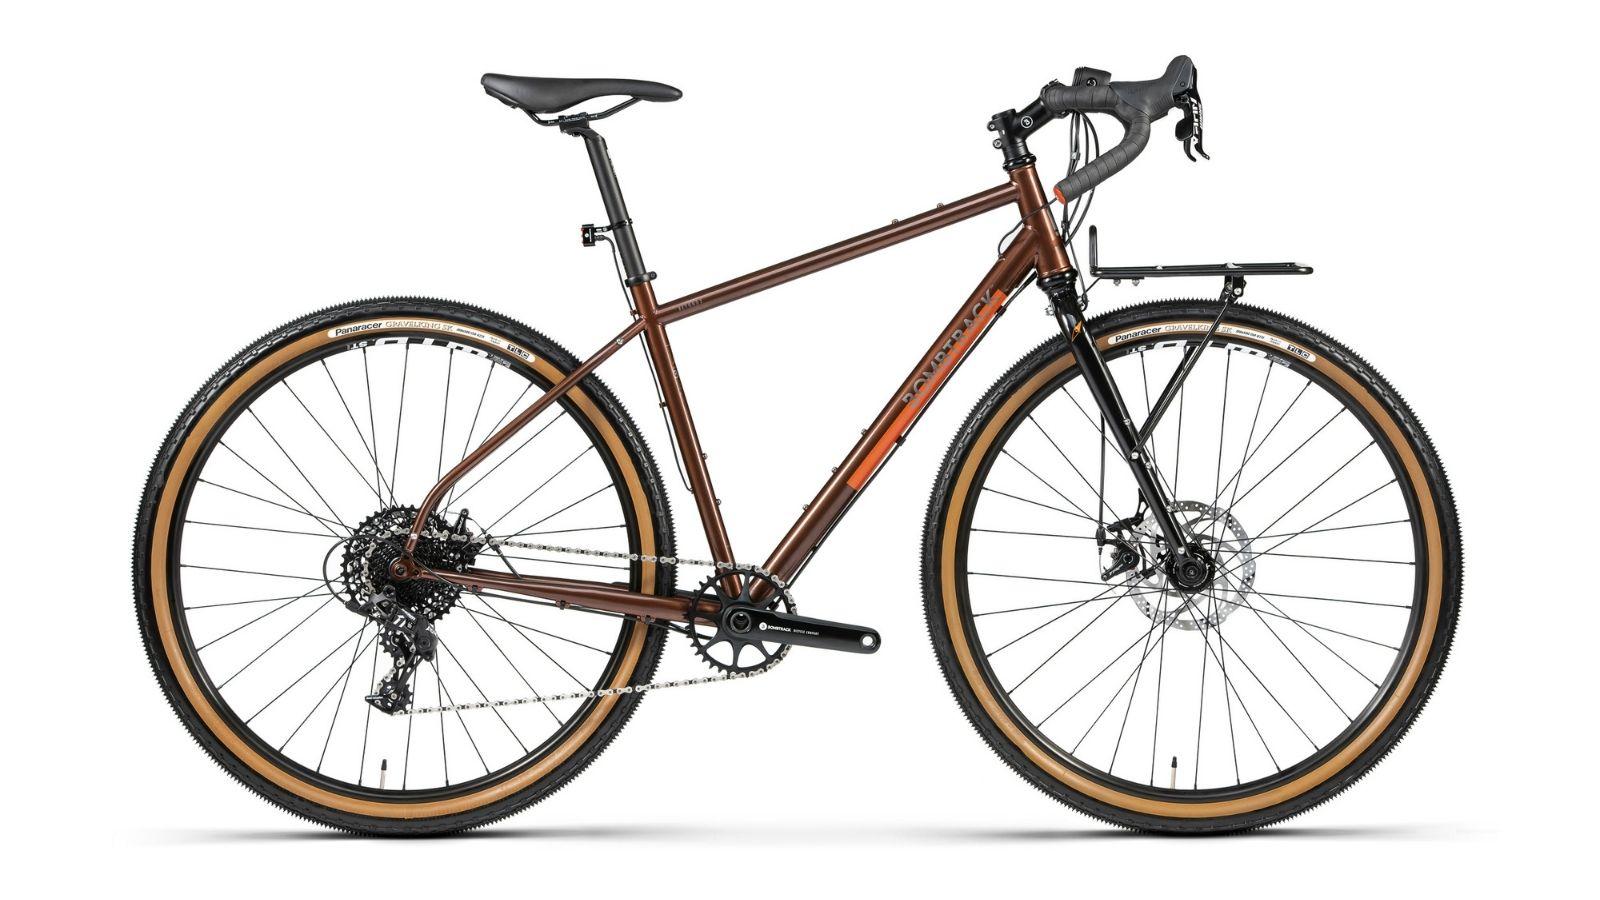 La bici da cicloturismo Bombtrack Beyond